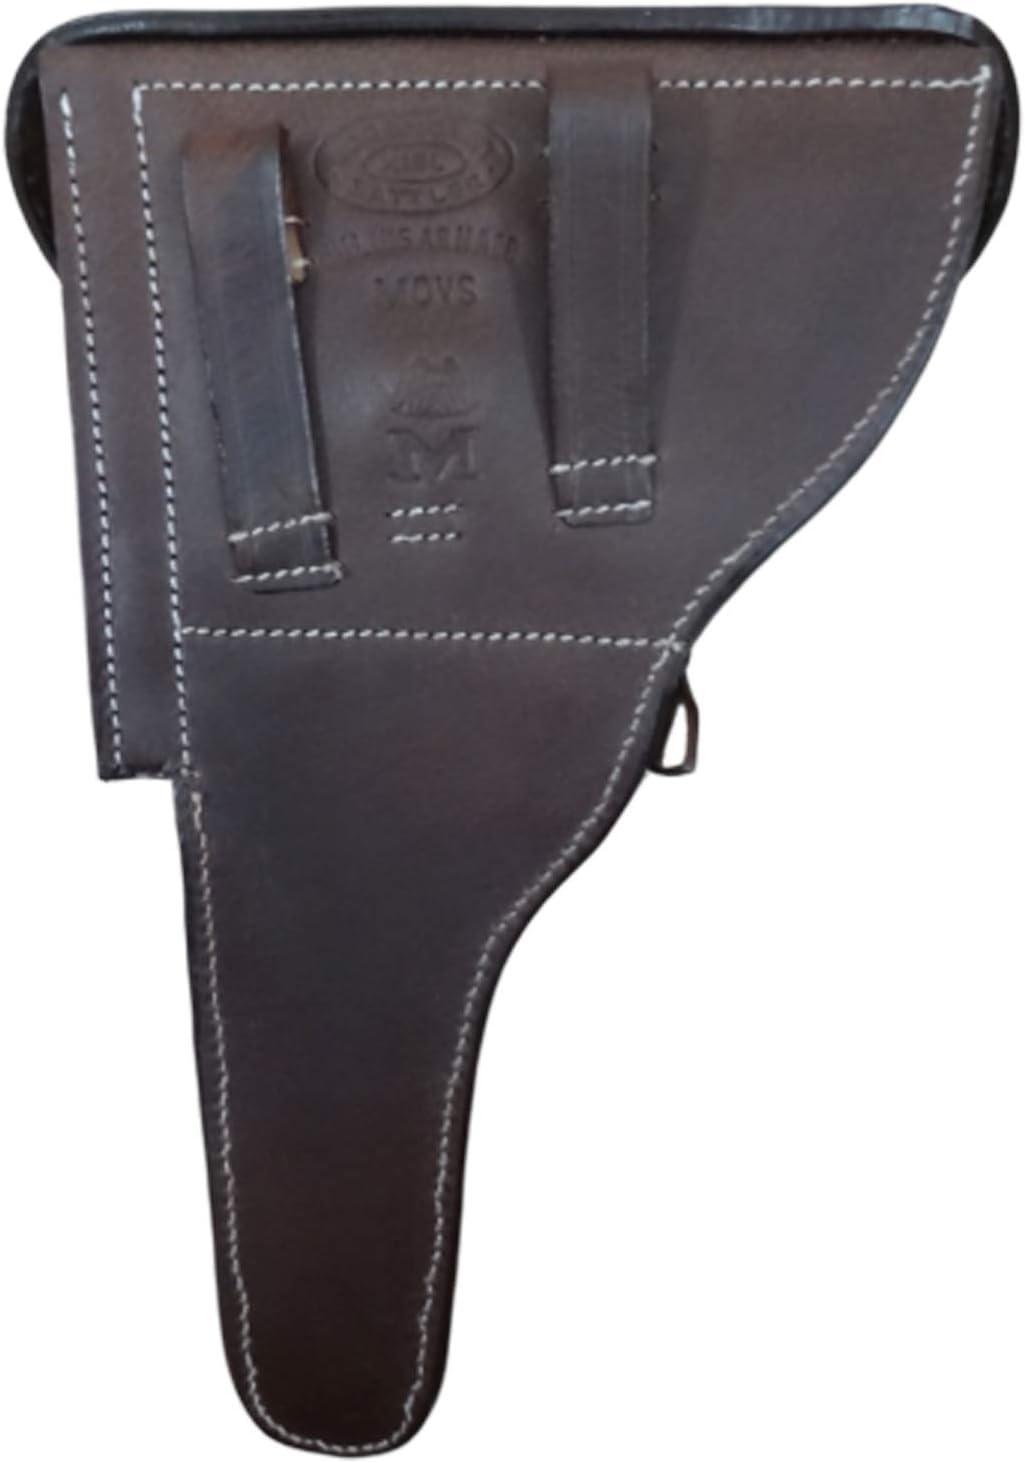 WWII Luger P08 6Barril alem/án Pistola w//Take Down Herramienta marr/ón Oscuro Reproducci/ón